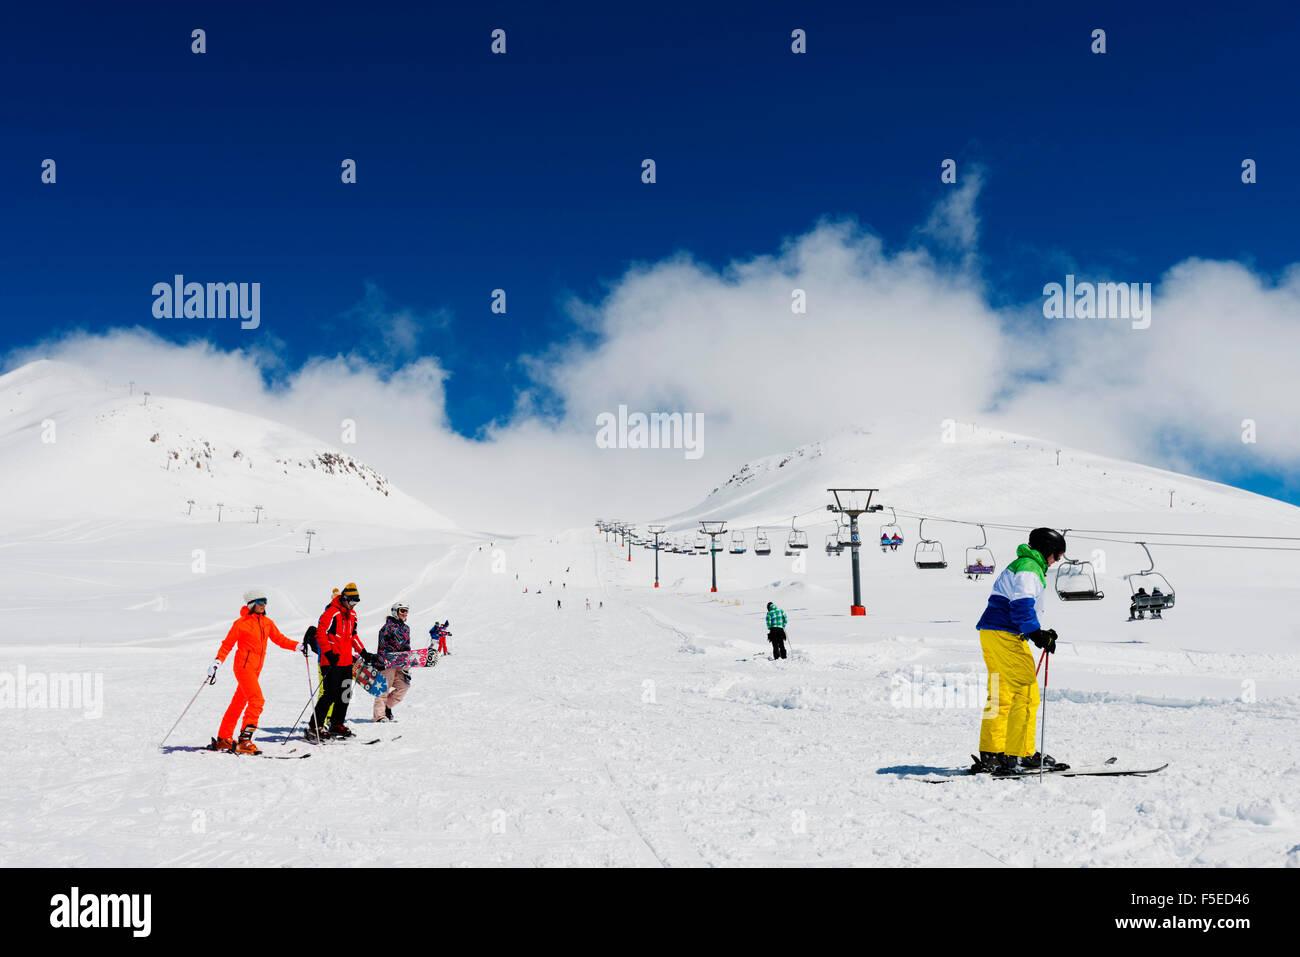 Skiers at Gudauri ski resort, Georgia, Caucasus region, Central Asia, Asia - Stock Image